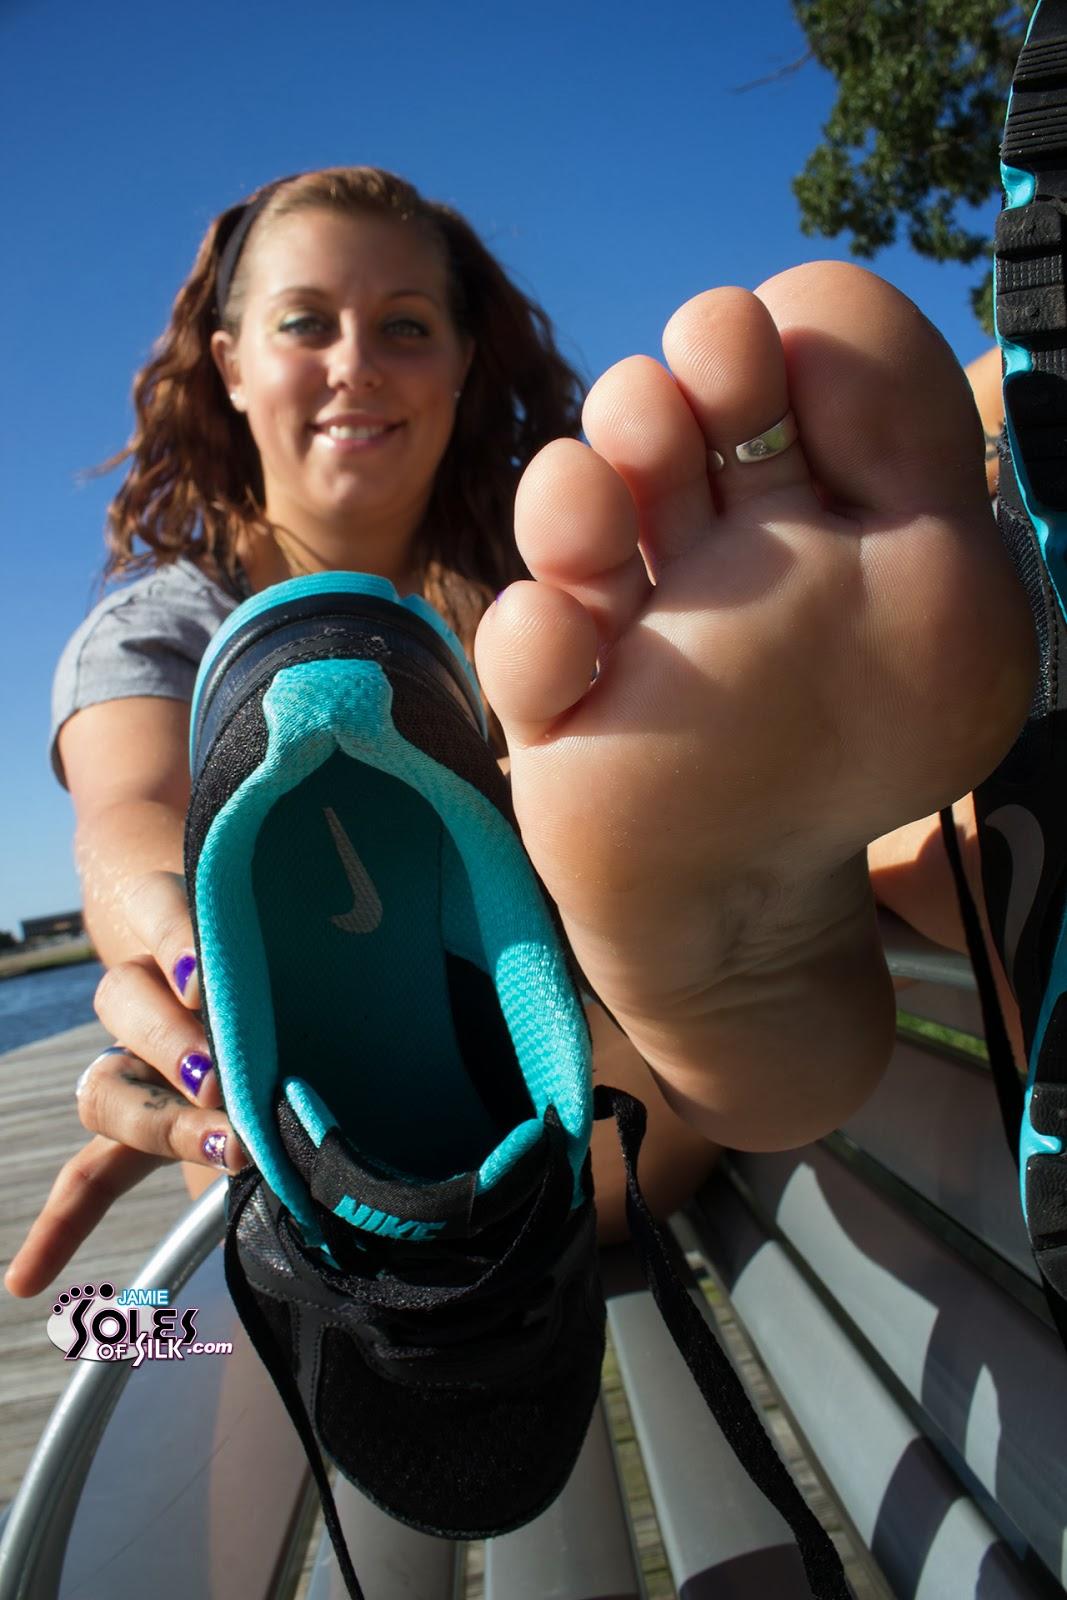 image Sweaty socks shoes feet